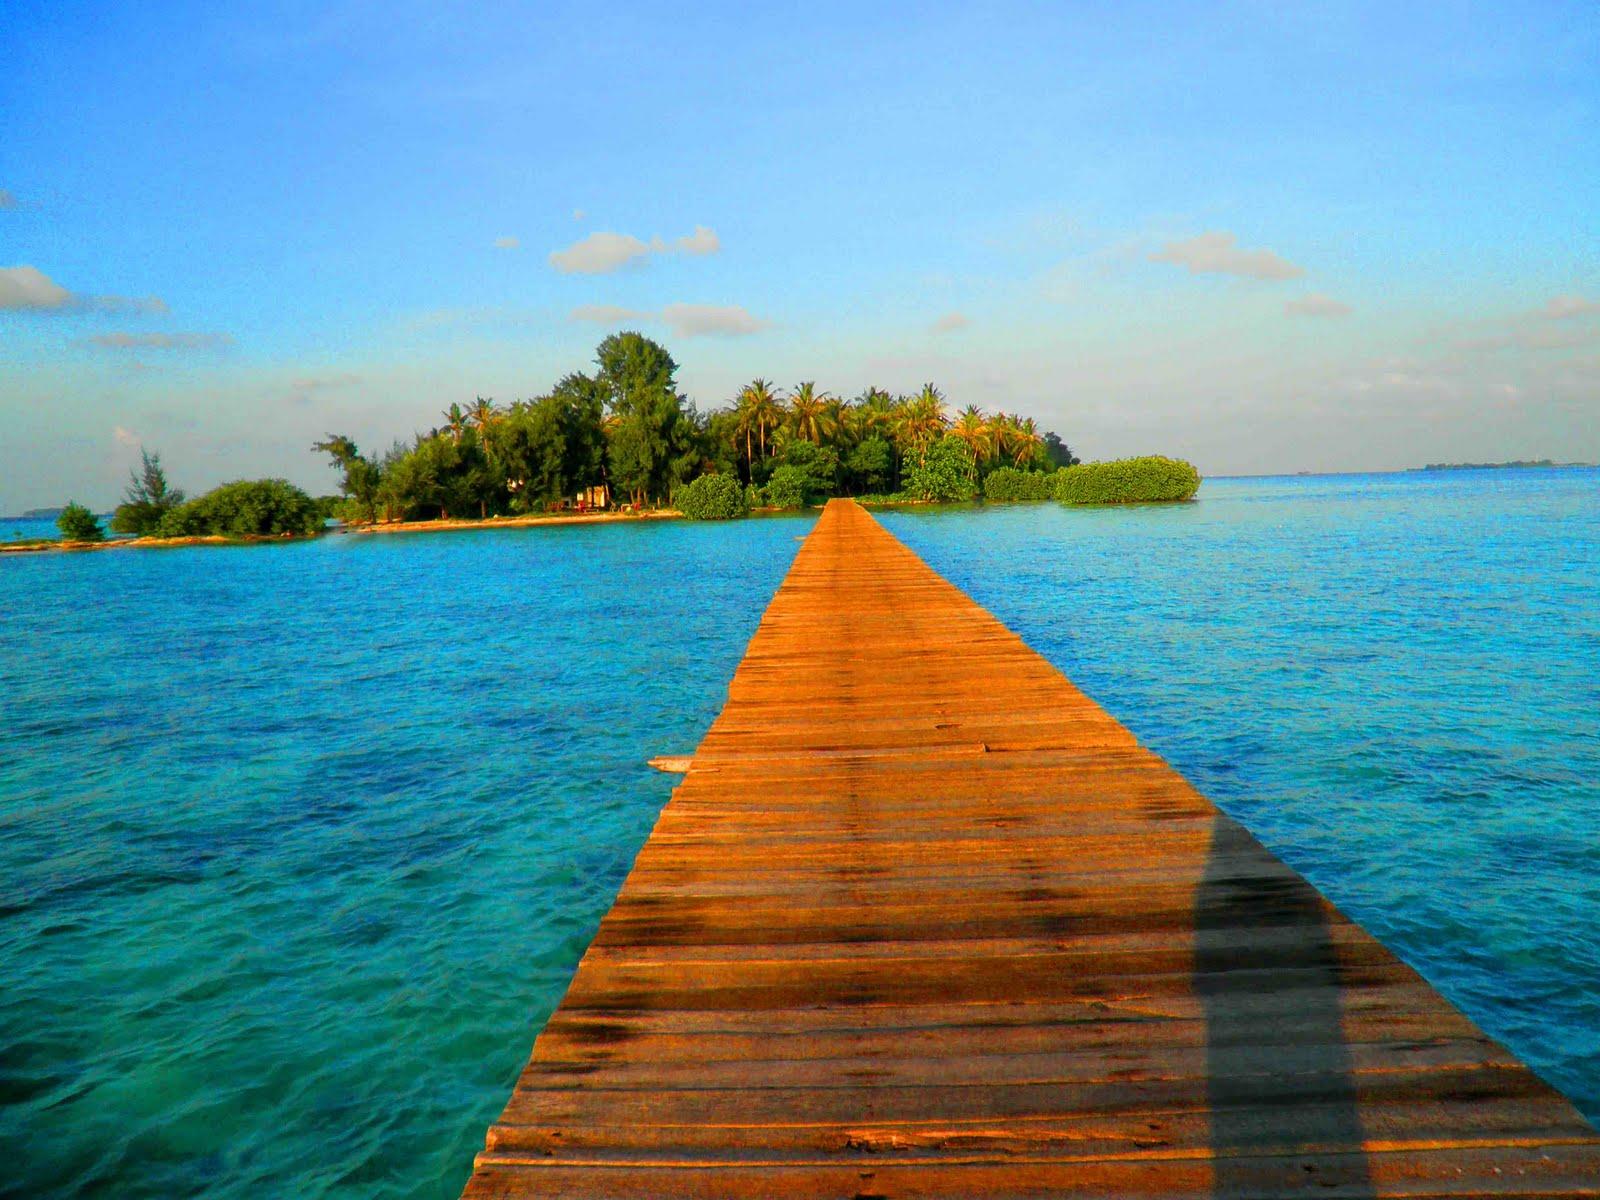 10 pesona indah wisata pulau tidung kepulauan seribu jakarta